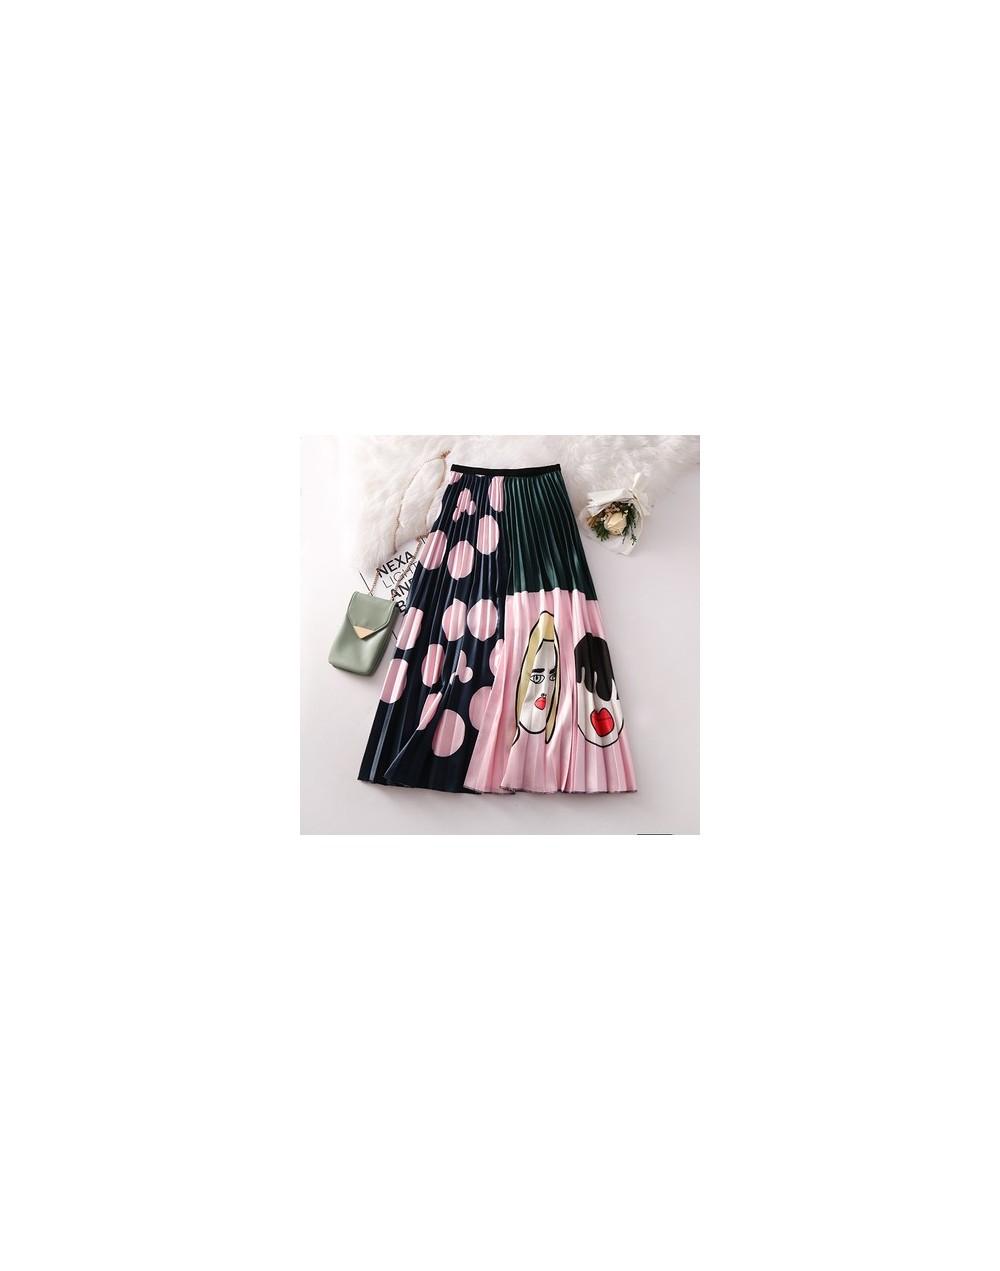 New Arrival Spring Women Cartoon Printed Elegant Pleated Long Skirts High Waist Harajuku Tulle A-Line Mid-Calf Skirts - Dots...